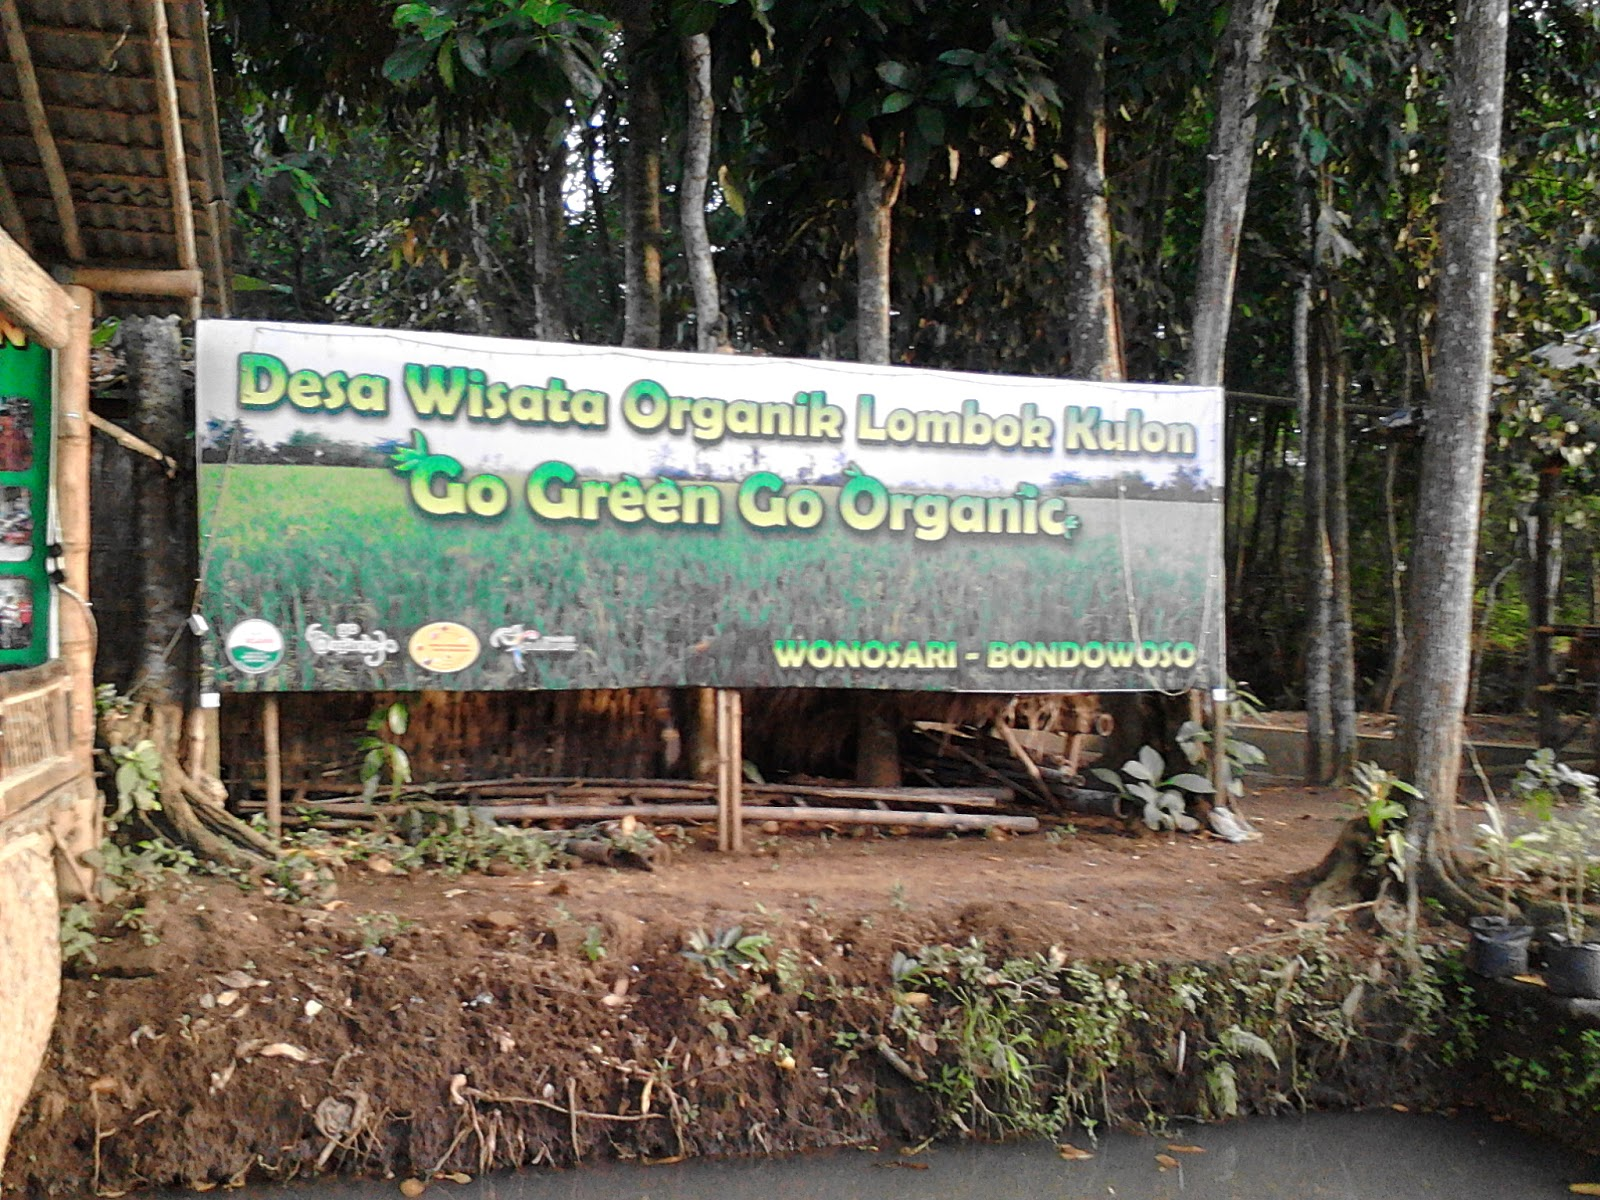 Desa Unik Selera Organik Termoter Bondowoso Wisata Kab